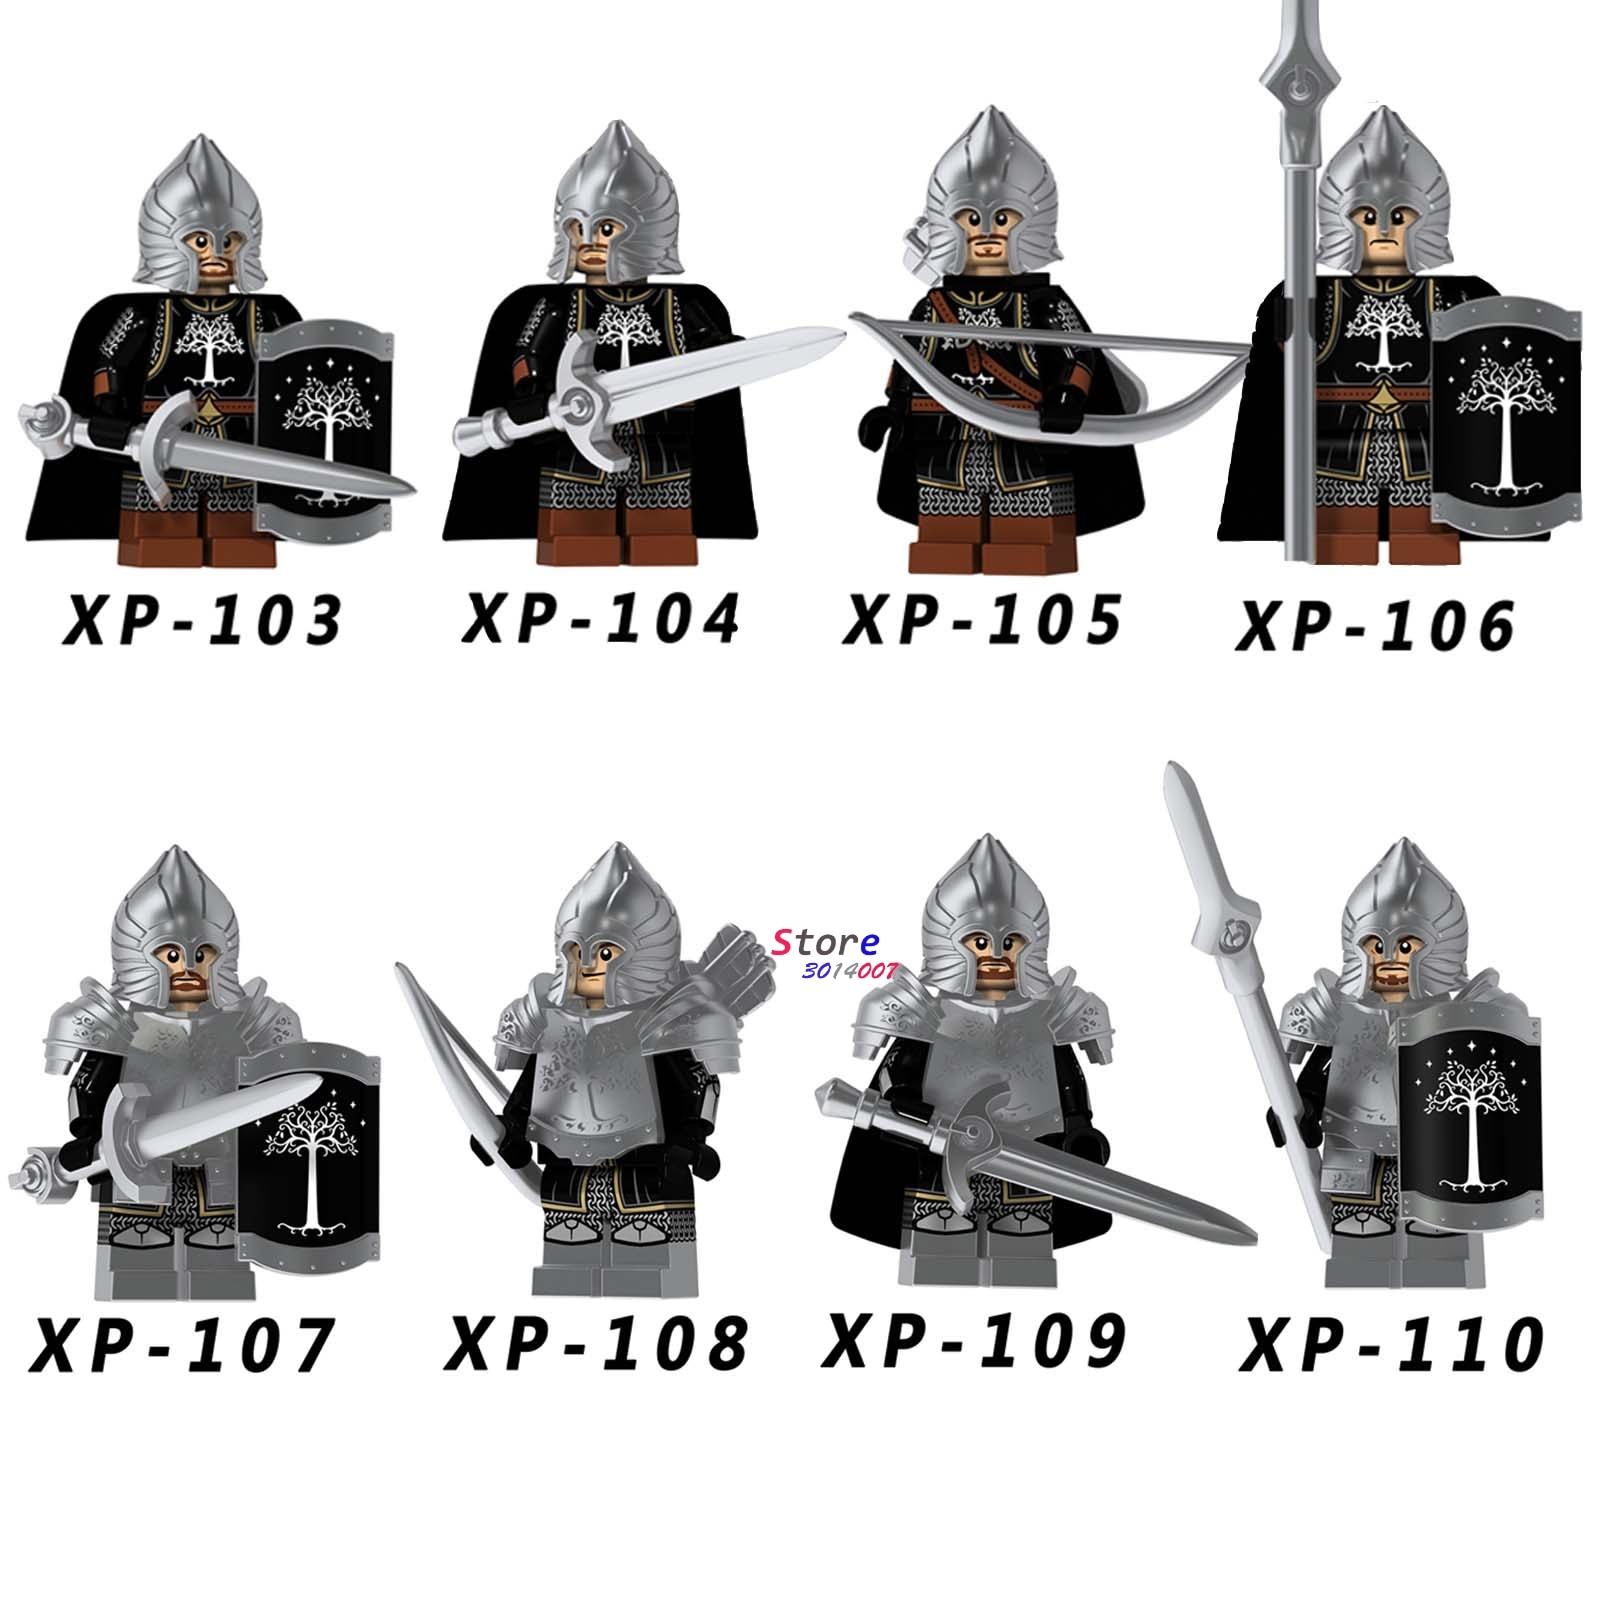 Single Medieval Knight Lord Of The Rings   Of Gondor Spear Archer Sword Model Building Blocks  Bricks Toys